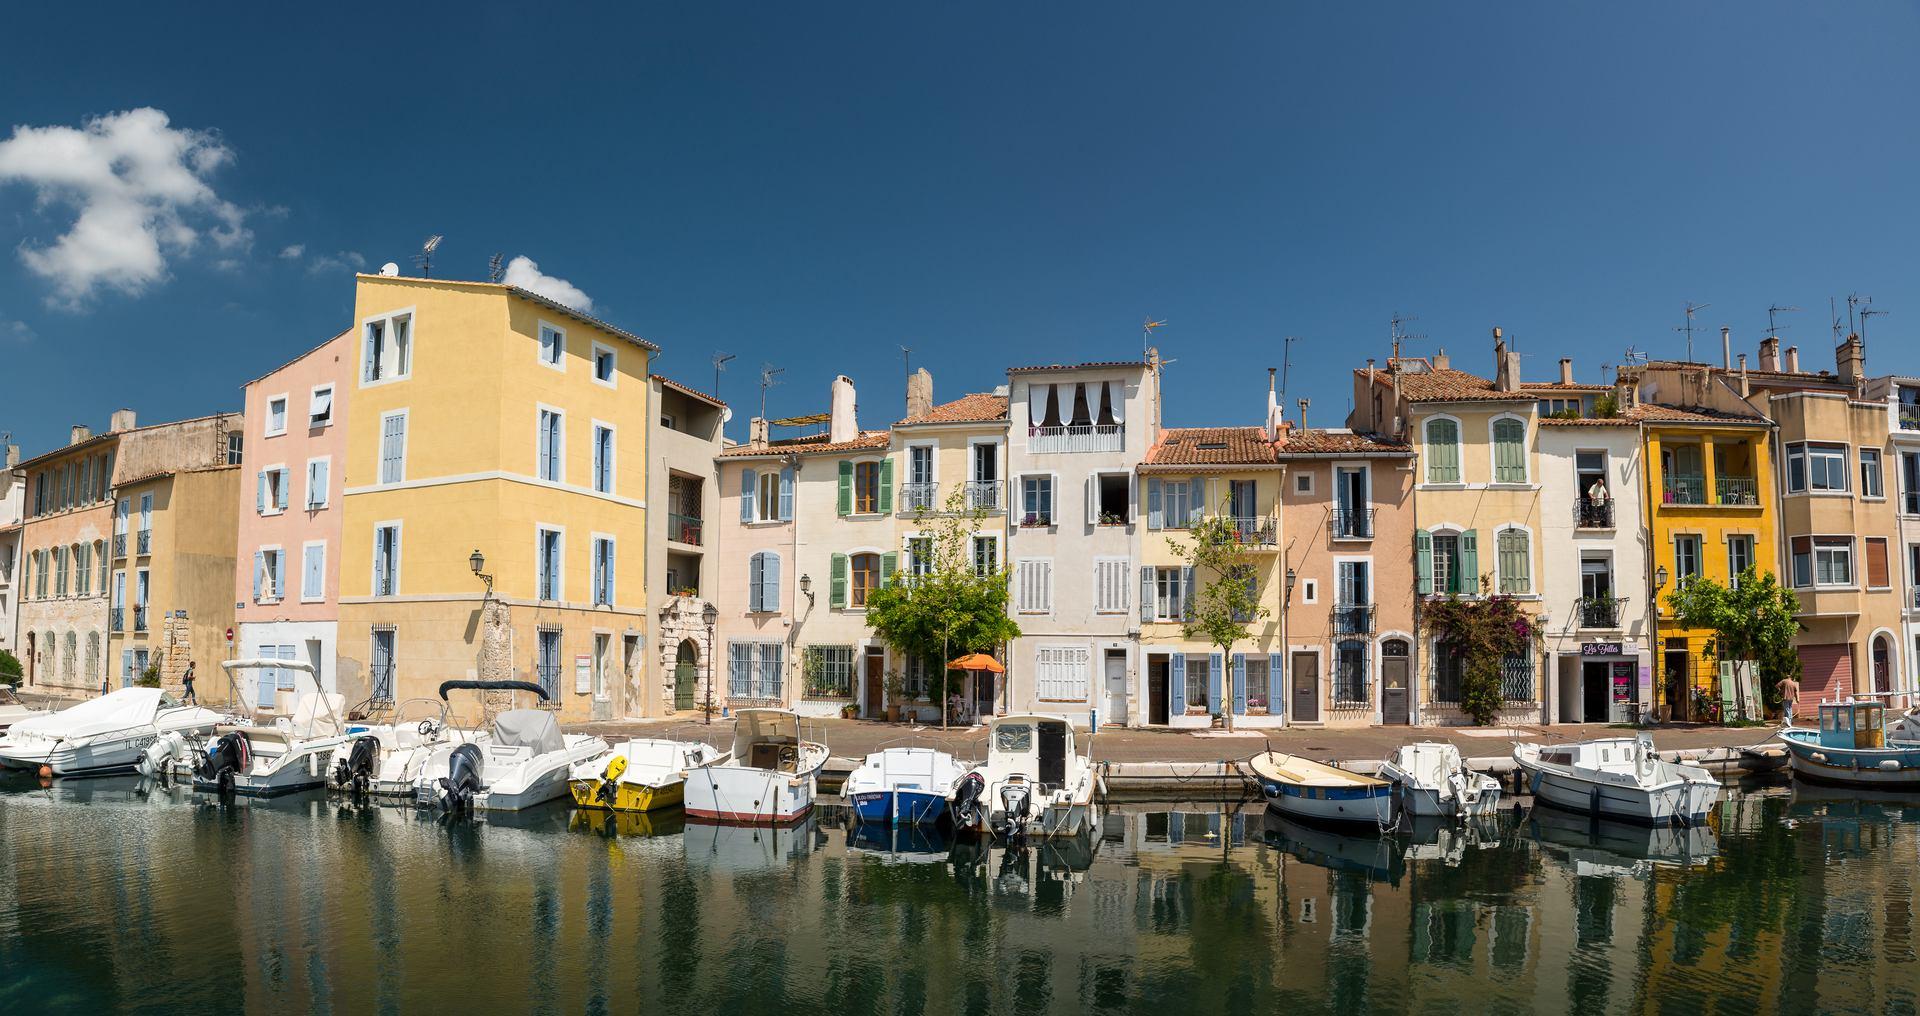 stories/2019-11-05-amazing-provence/martigues